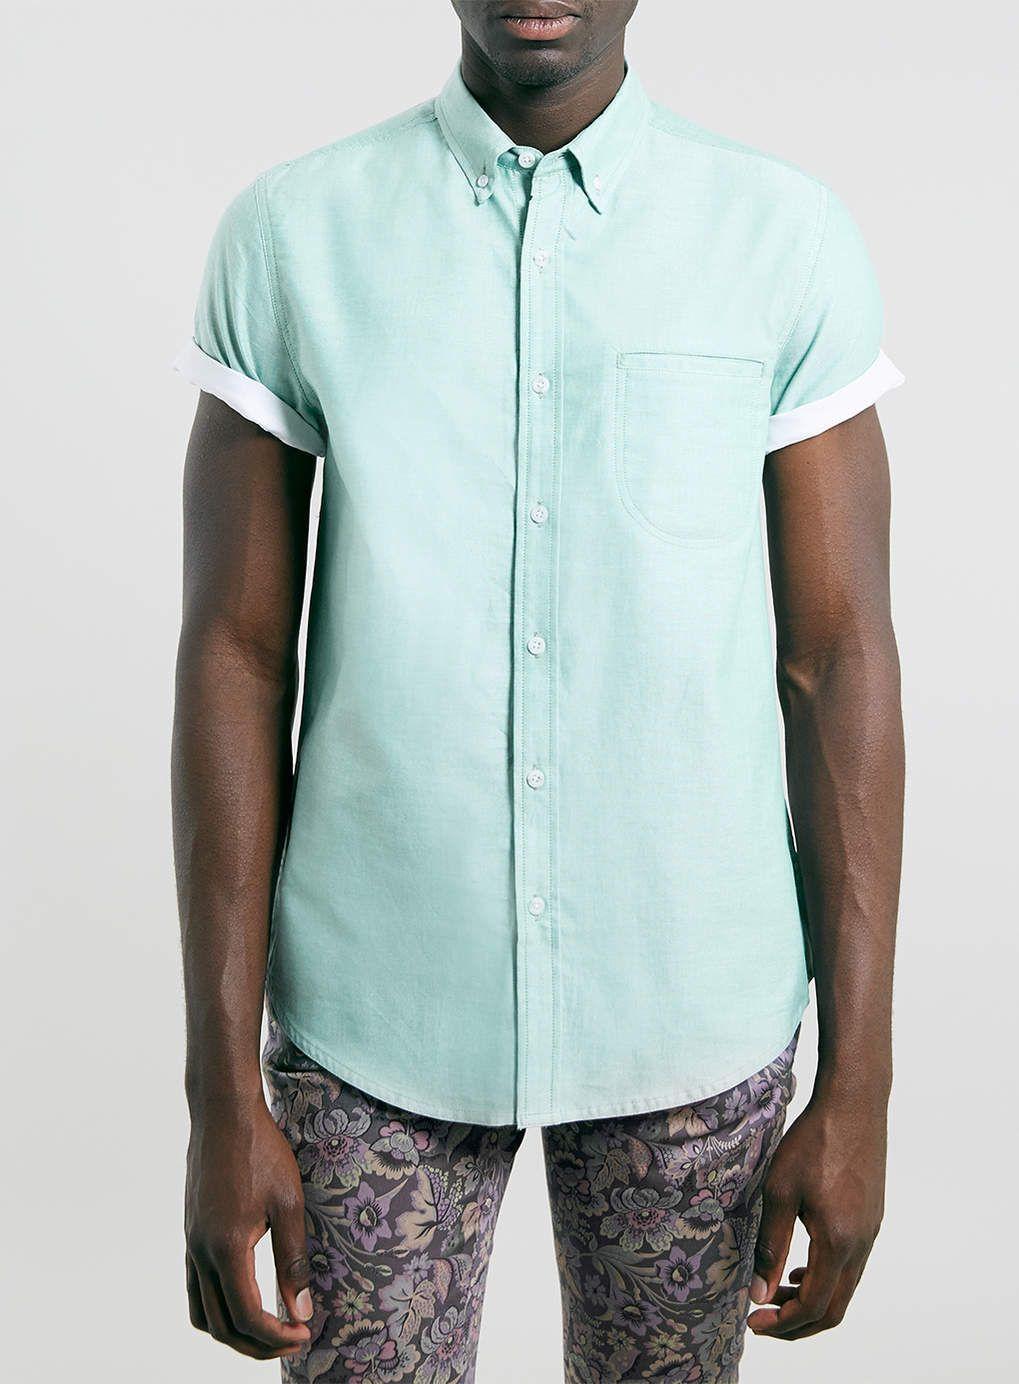 Green Contrast Oxford short sleeve Shirt - Topman